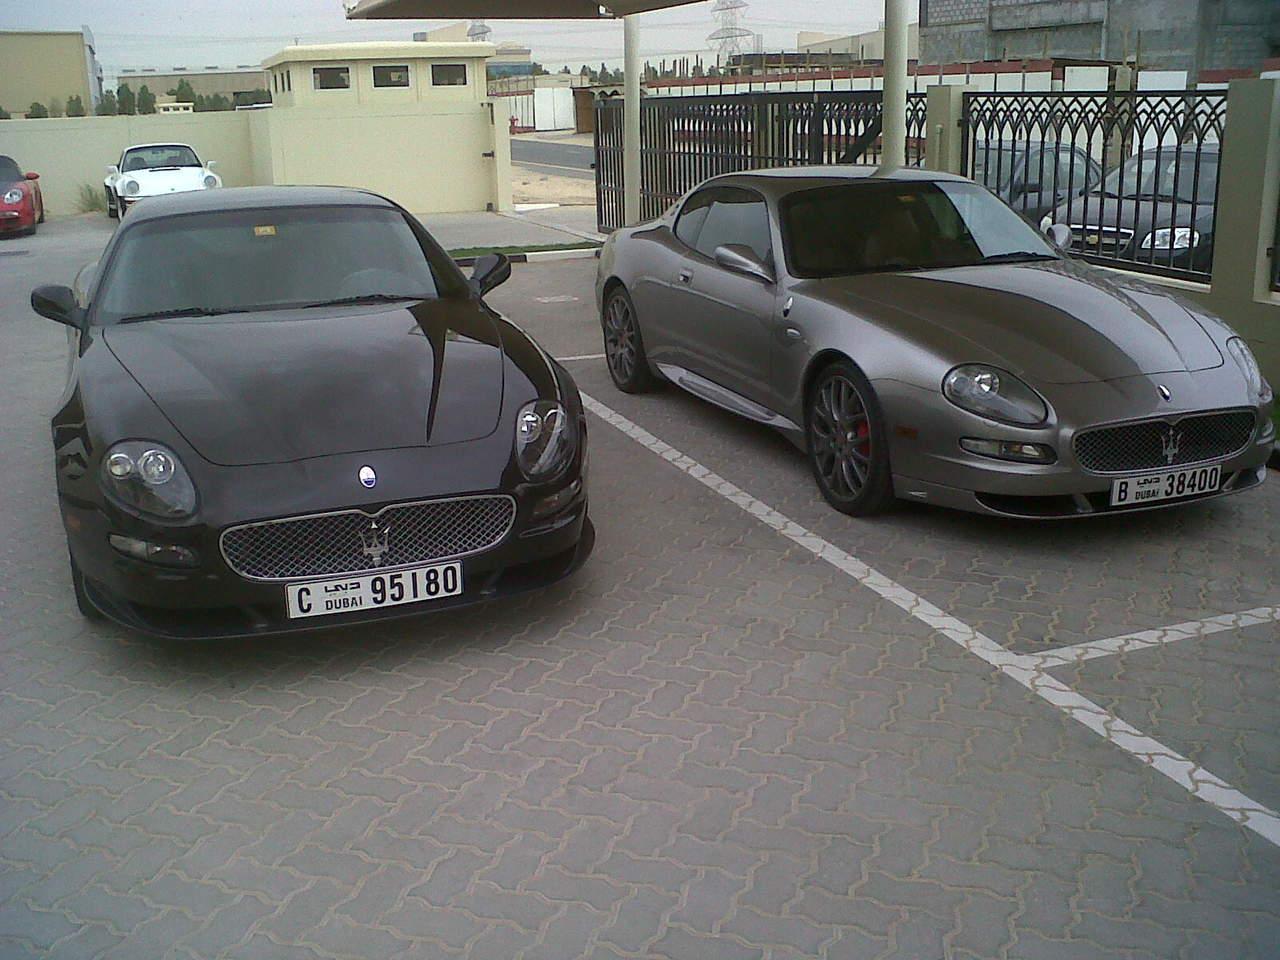 GS LE & MCV in Dubai-img01731-20120417-1618.jpg